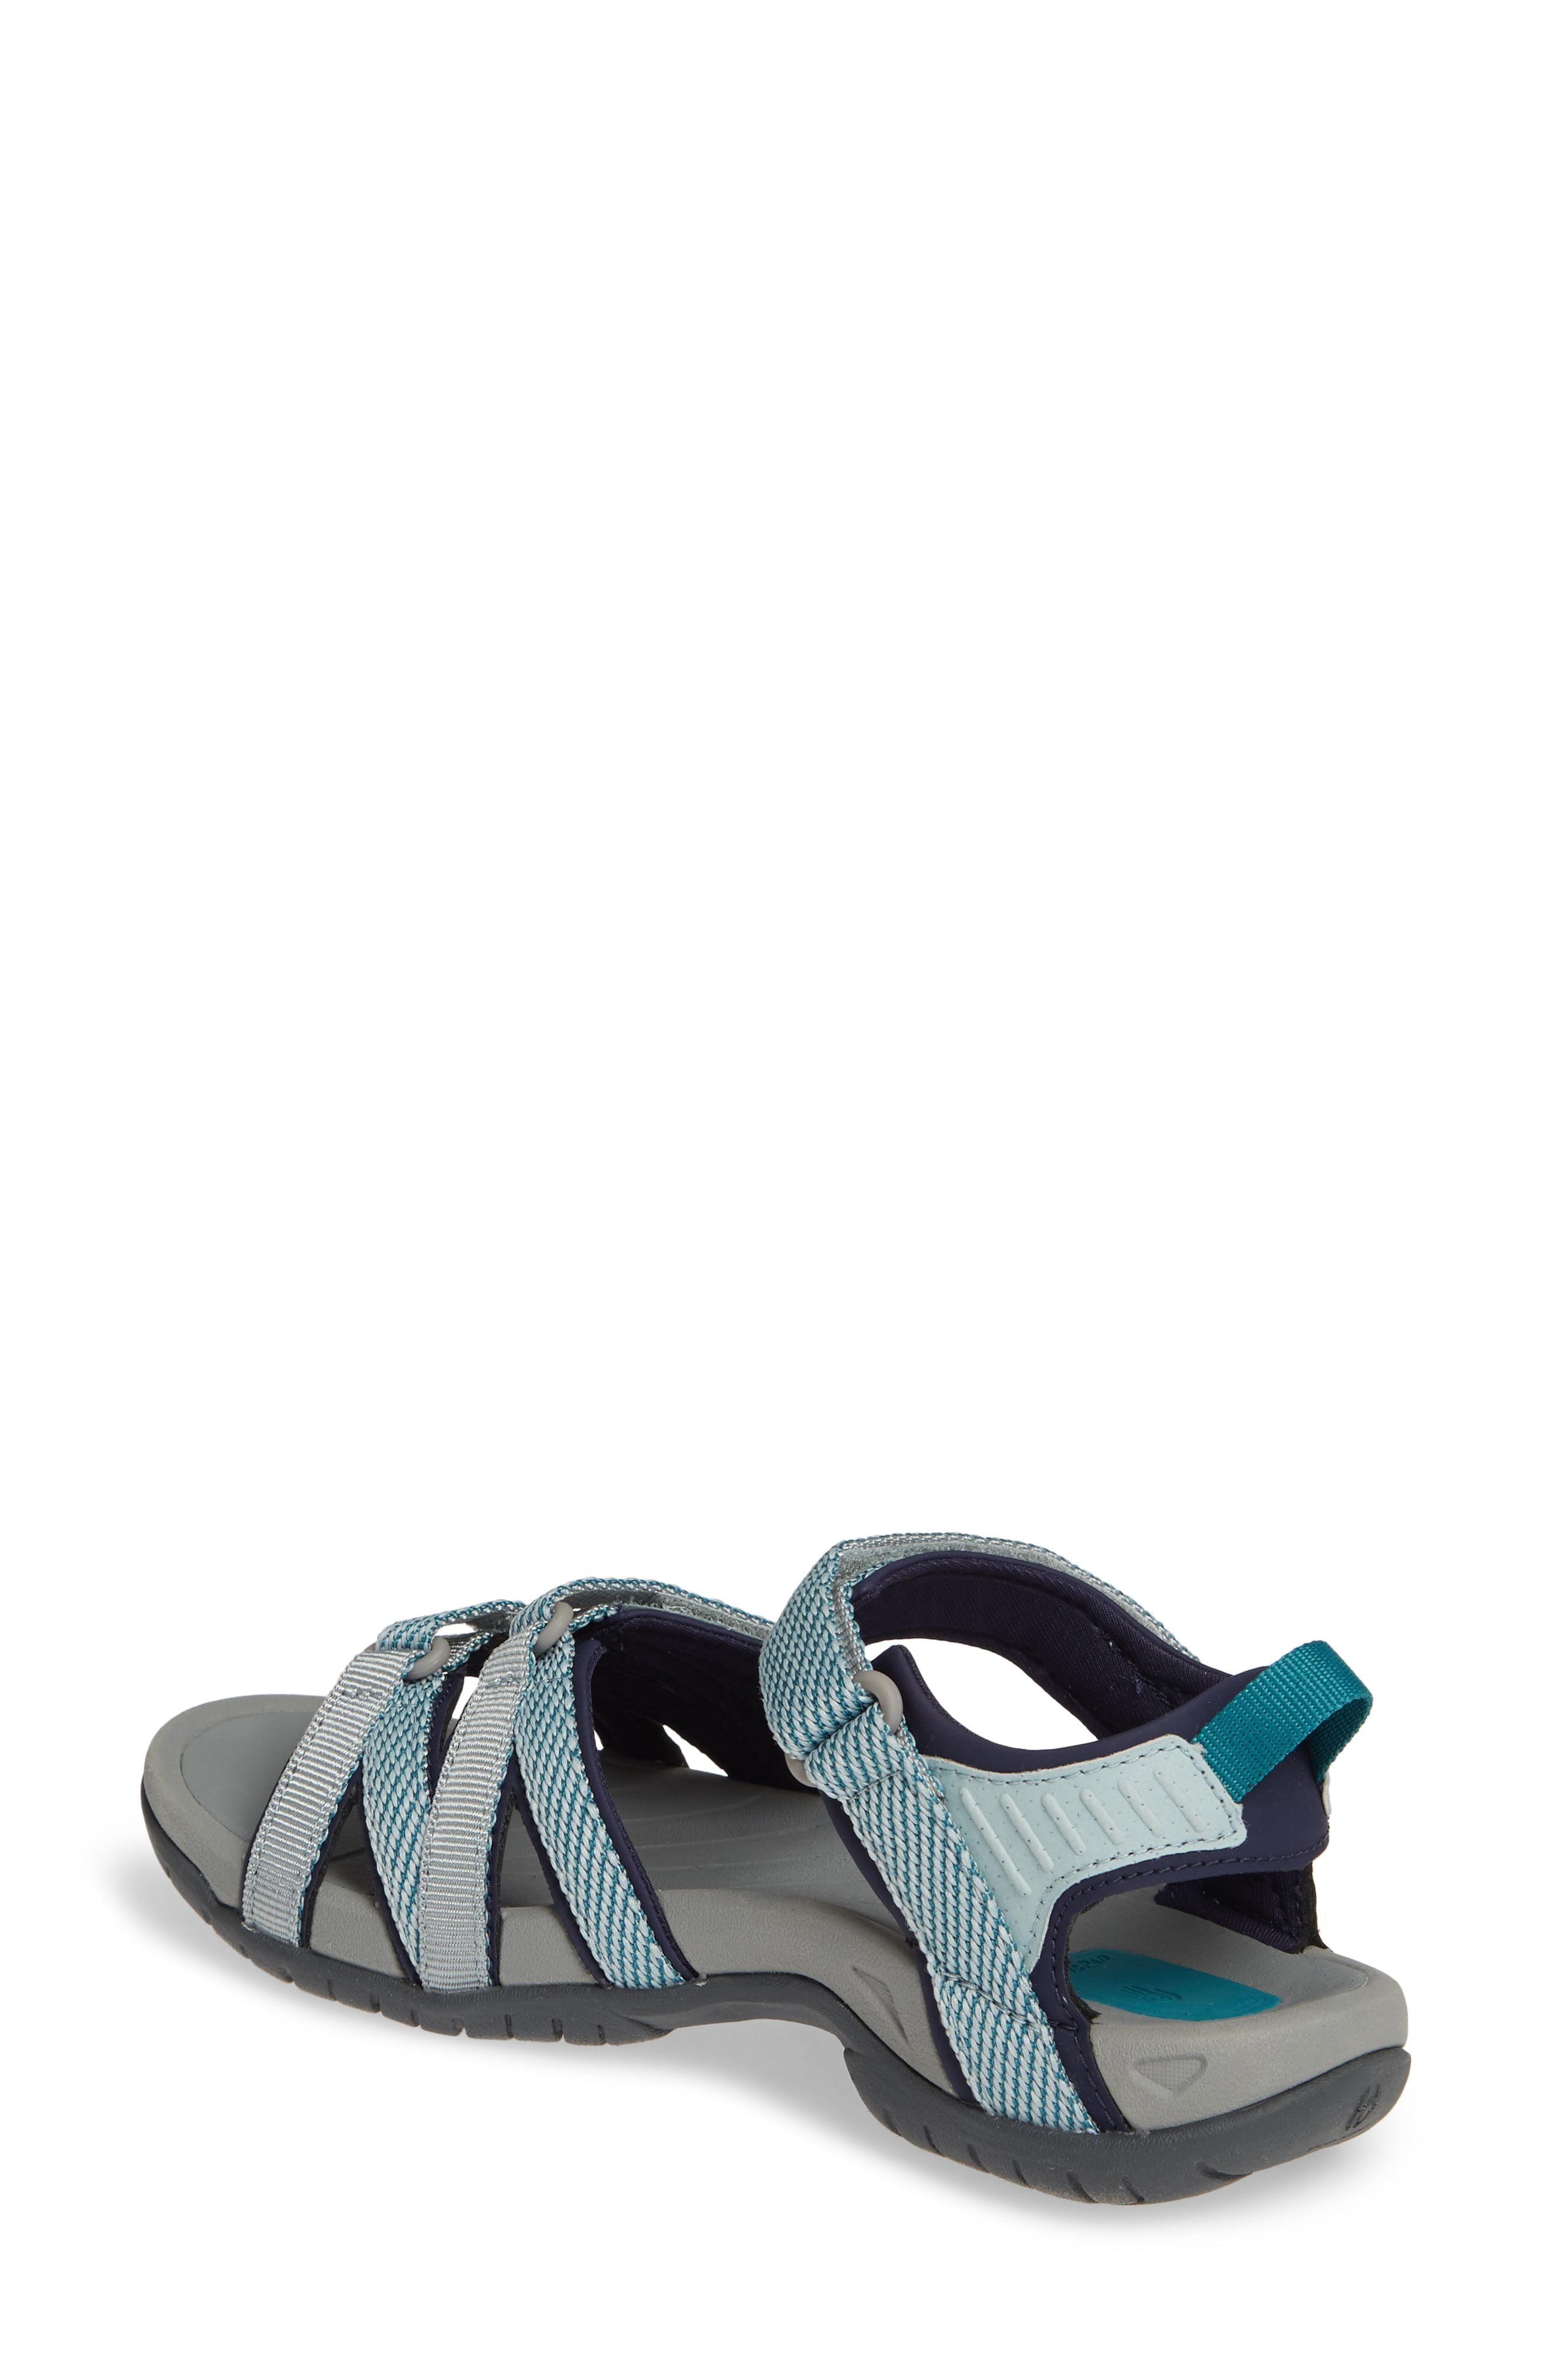 2c24b8f1519a Lyst - Teva Tirra Sandals in Gray - Save 9%